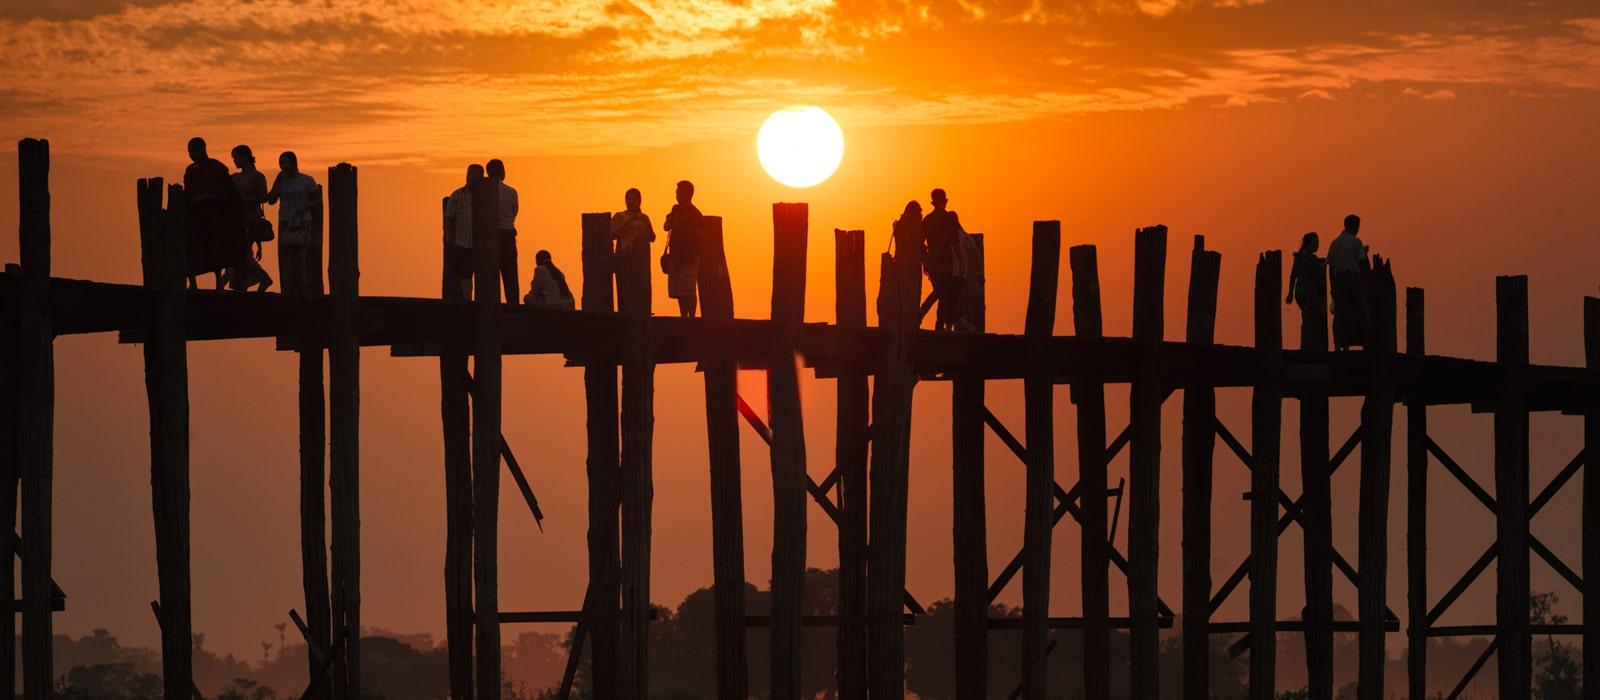 img-diapo-entete - Myanmar-1600x700-8.jpg